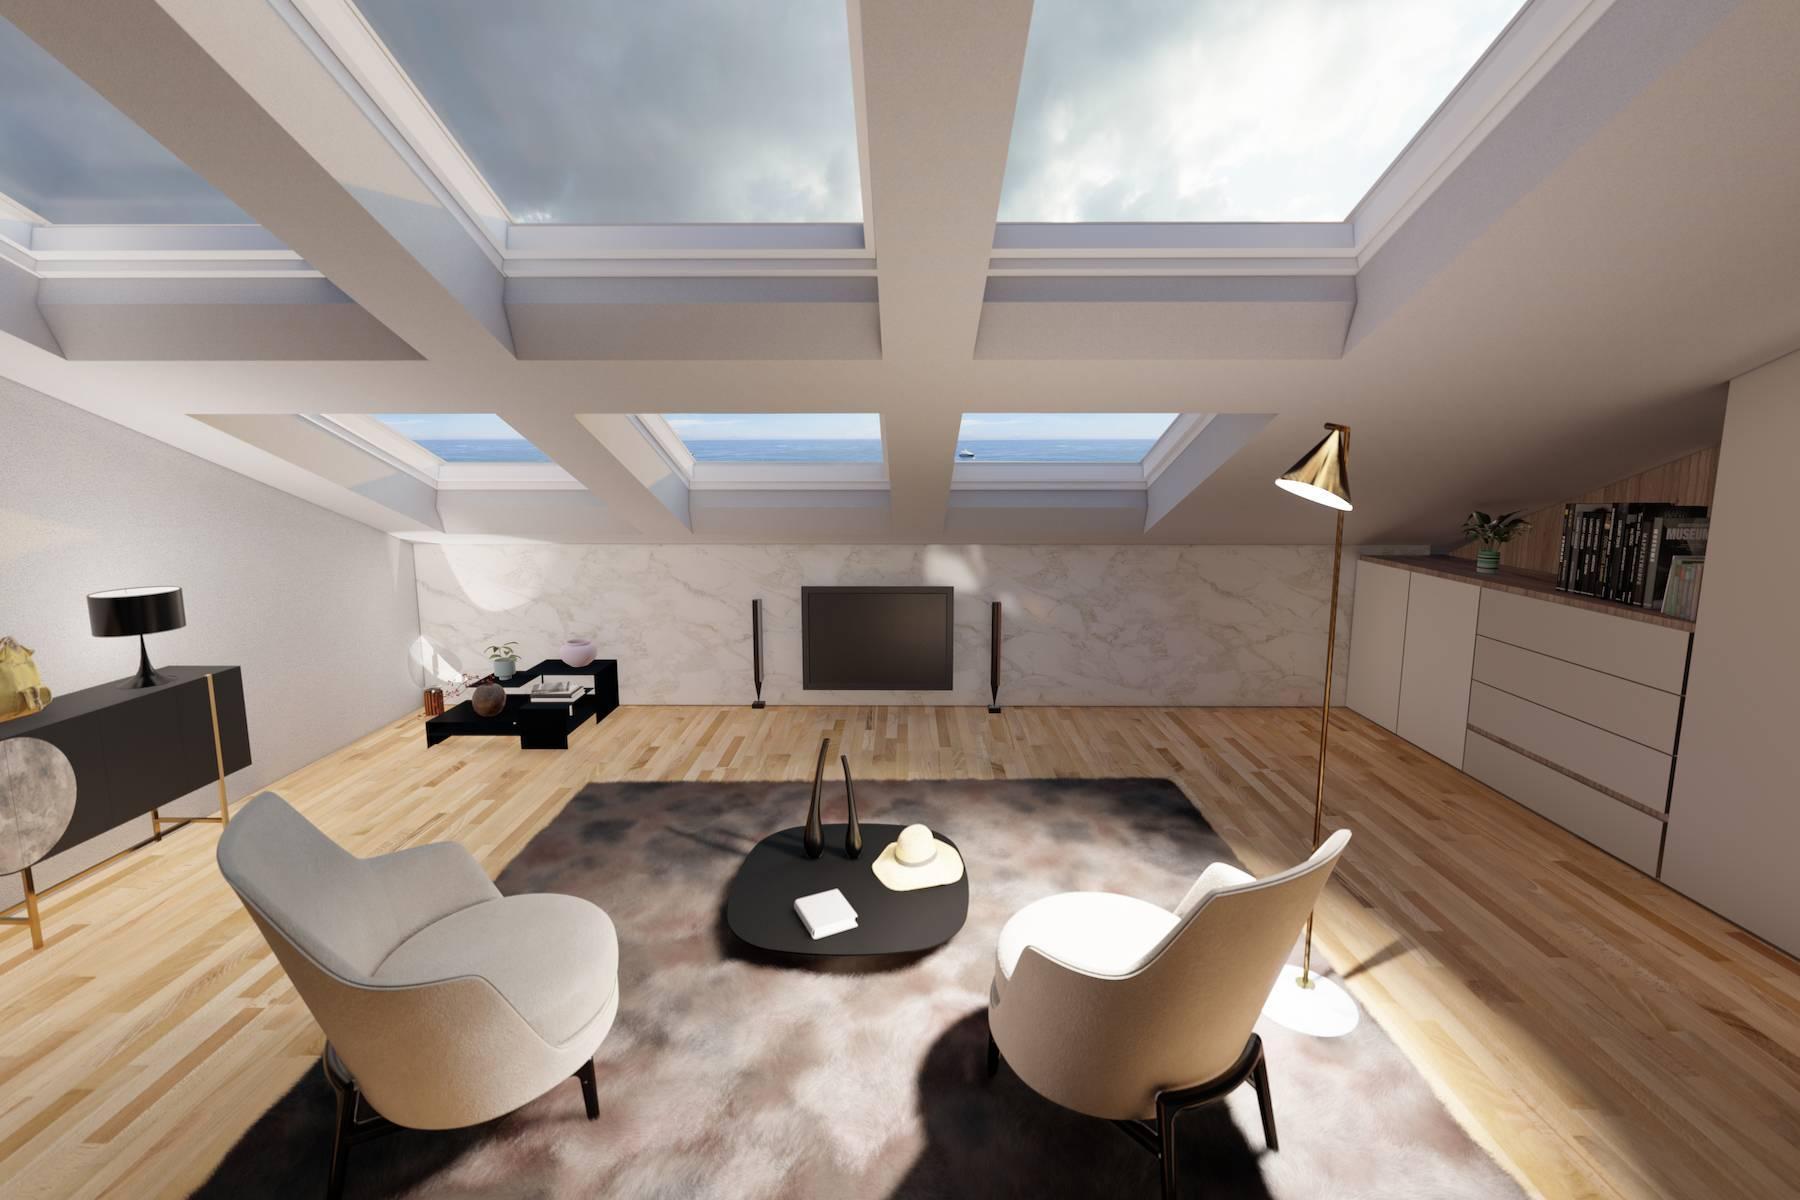 Luxus-Wohnungen am Meer in Viareggio - 11